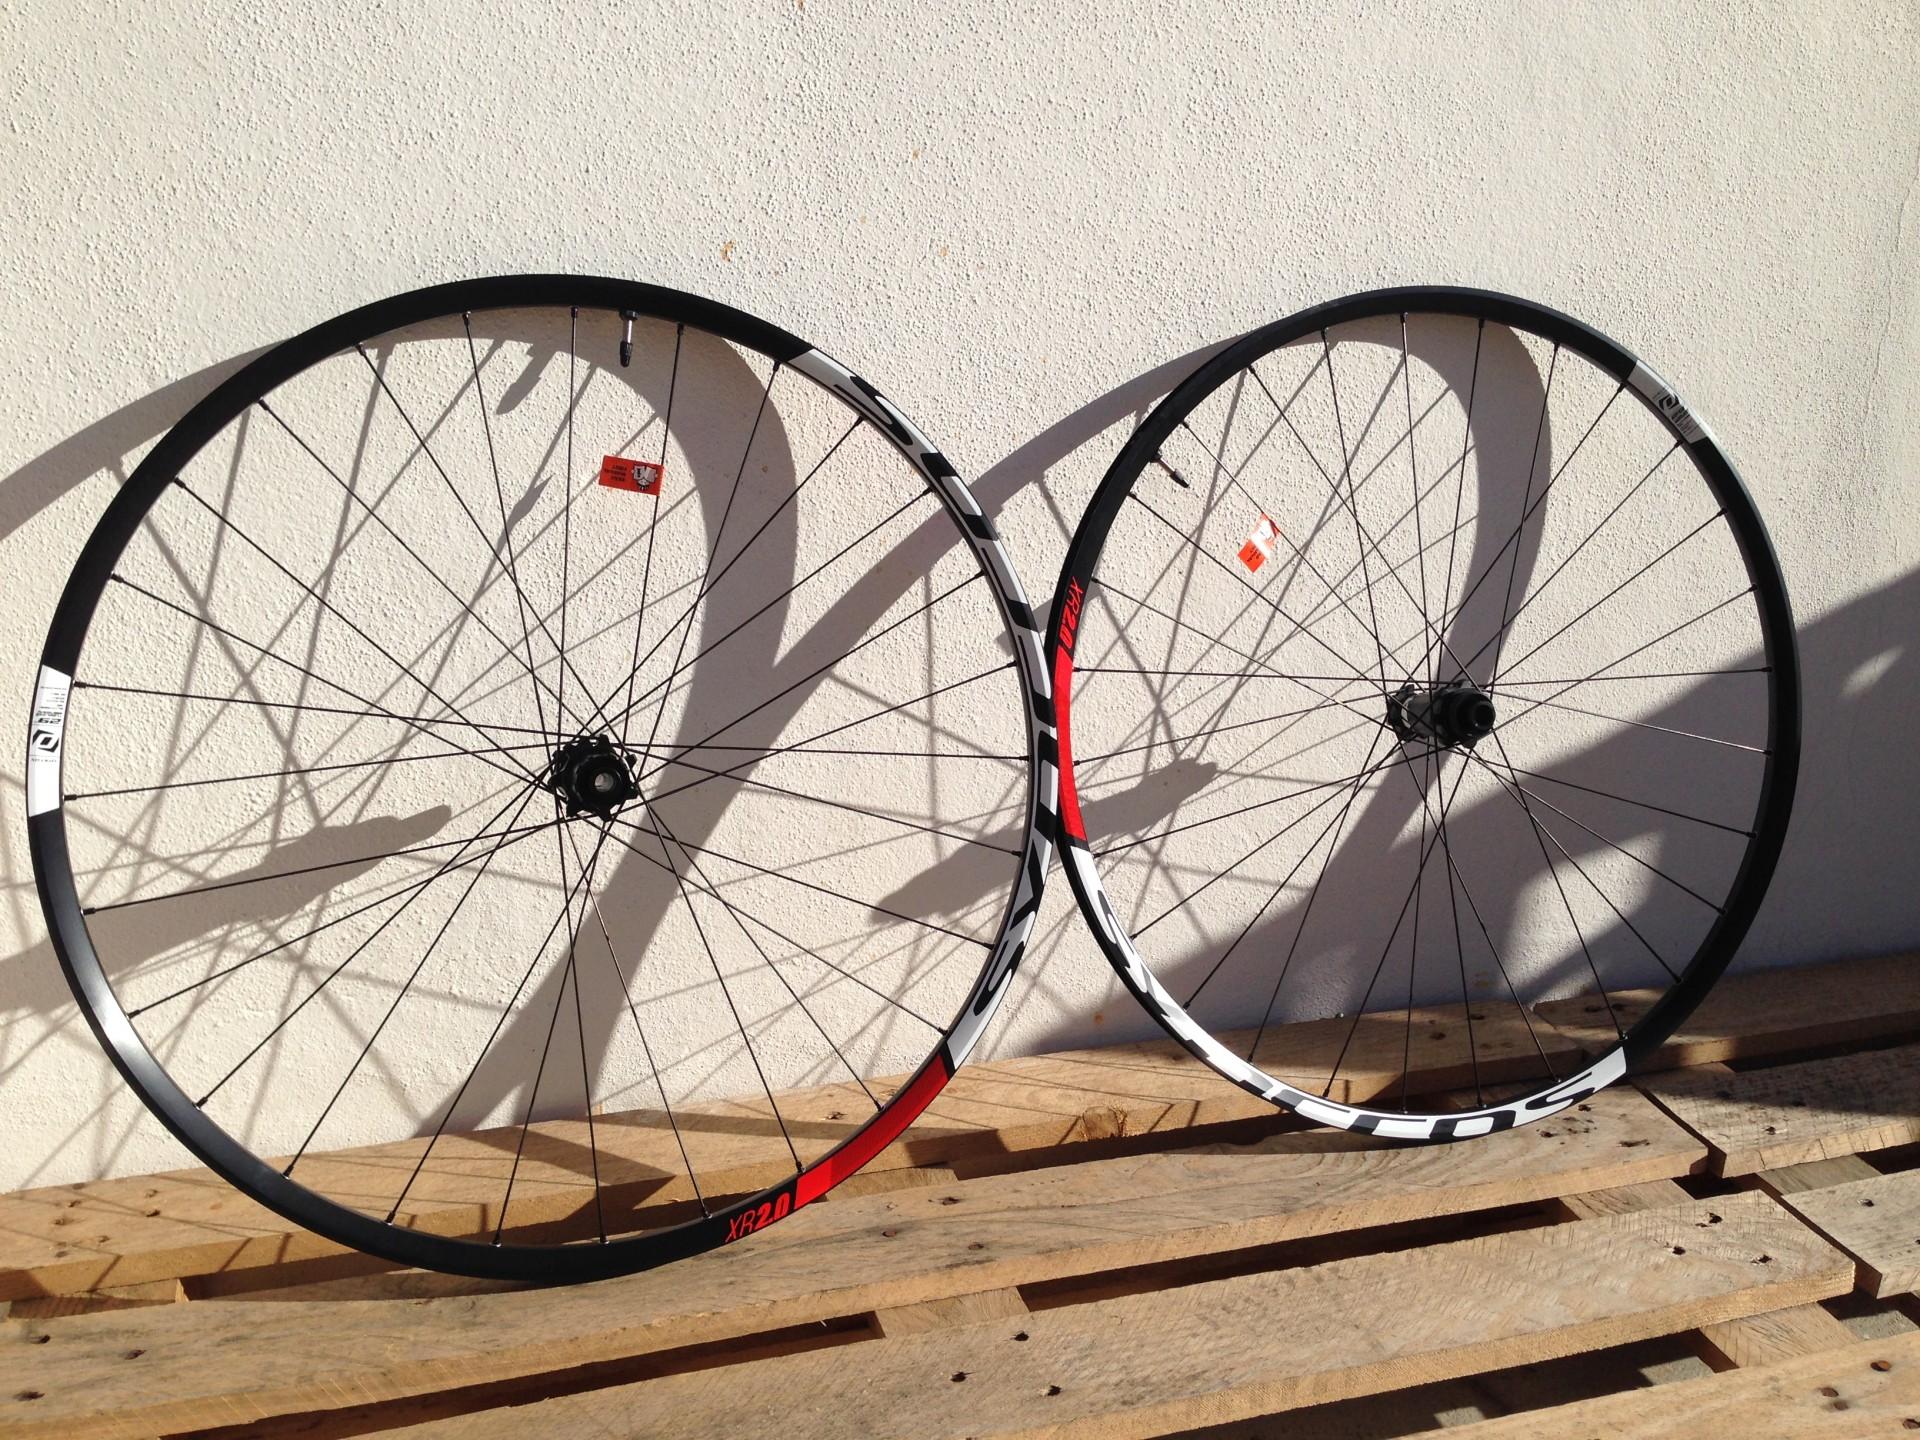 Rodas Syncros (DT Swiss) 29 Boost